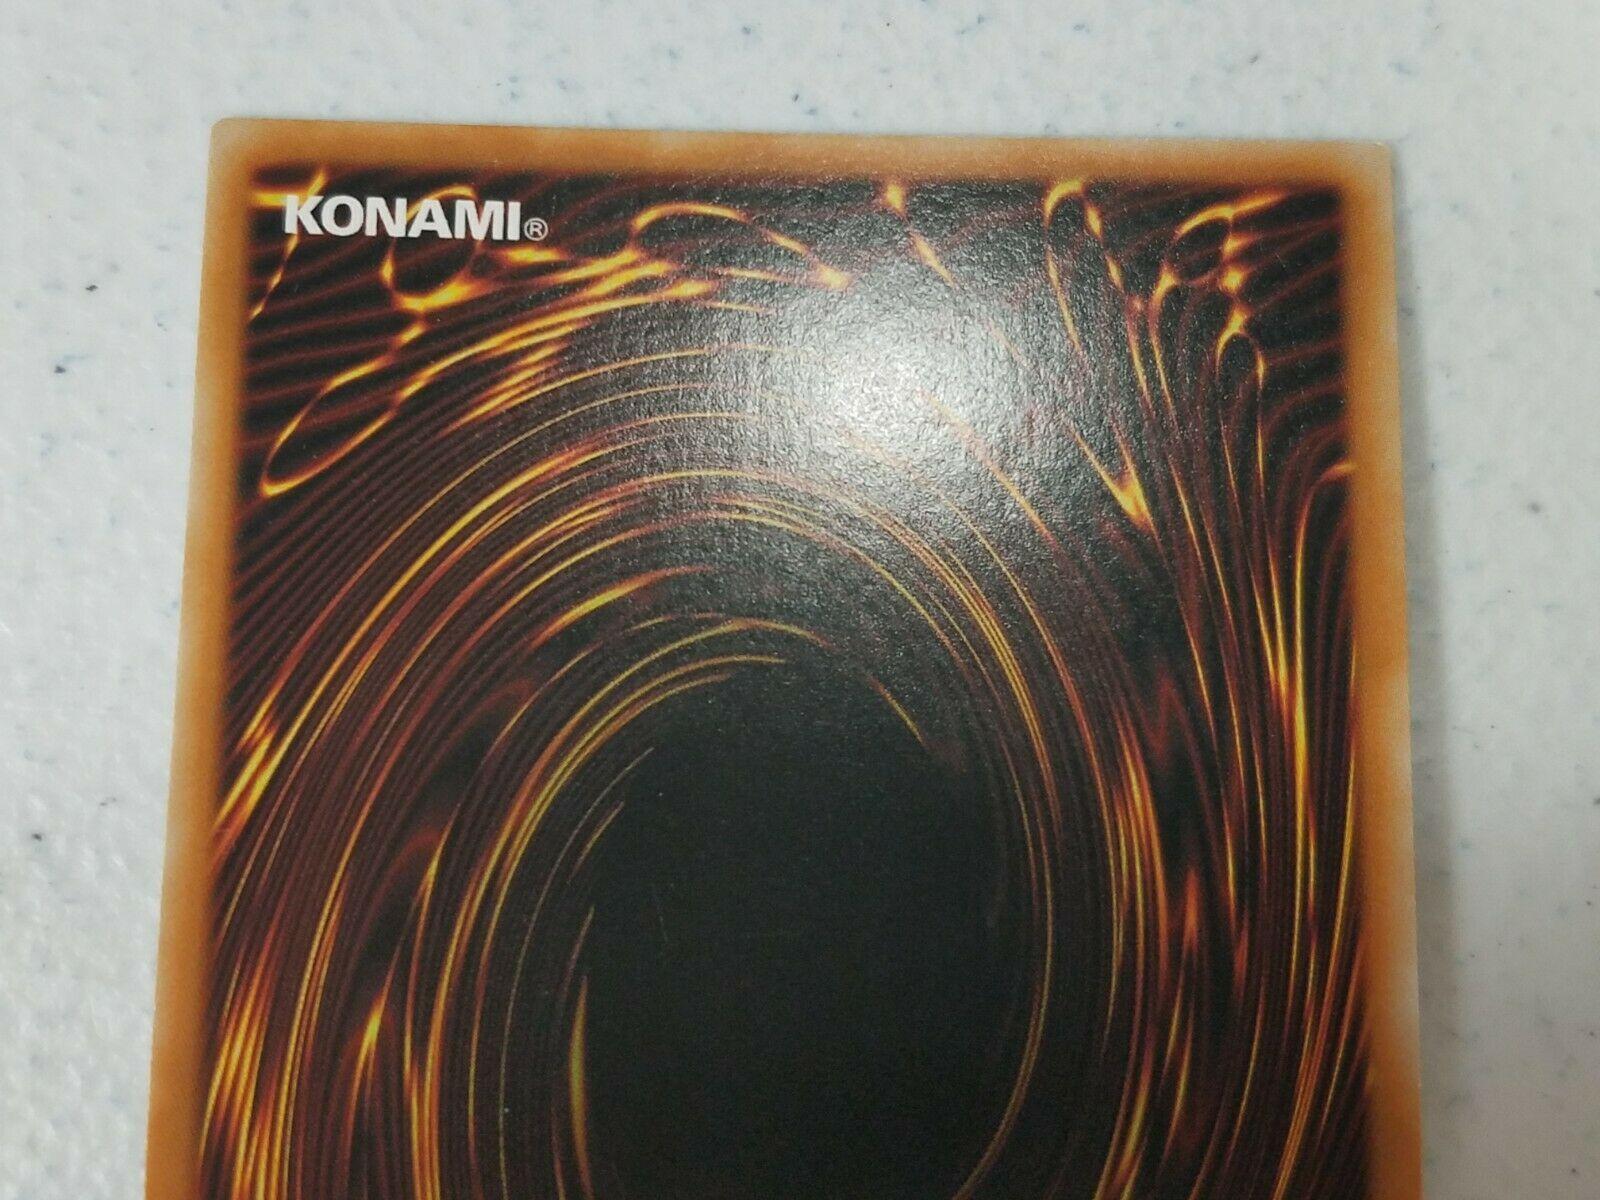 Yu-gi-oh! Trading Card - Wattsychic Fighter x2 - WSUP-EN041 - Super Rare 1st Ed.